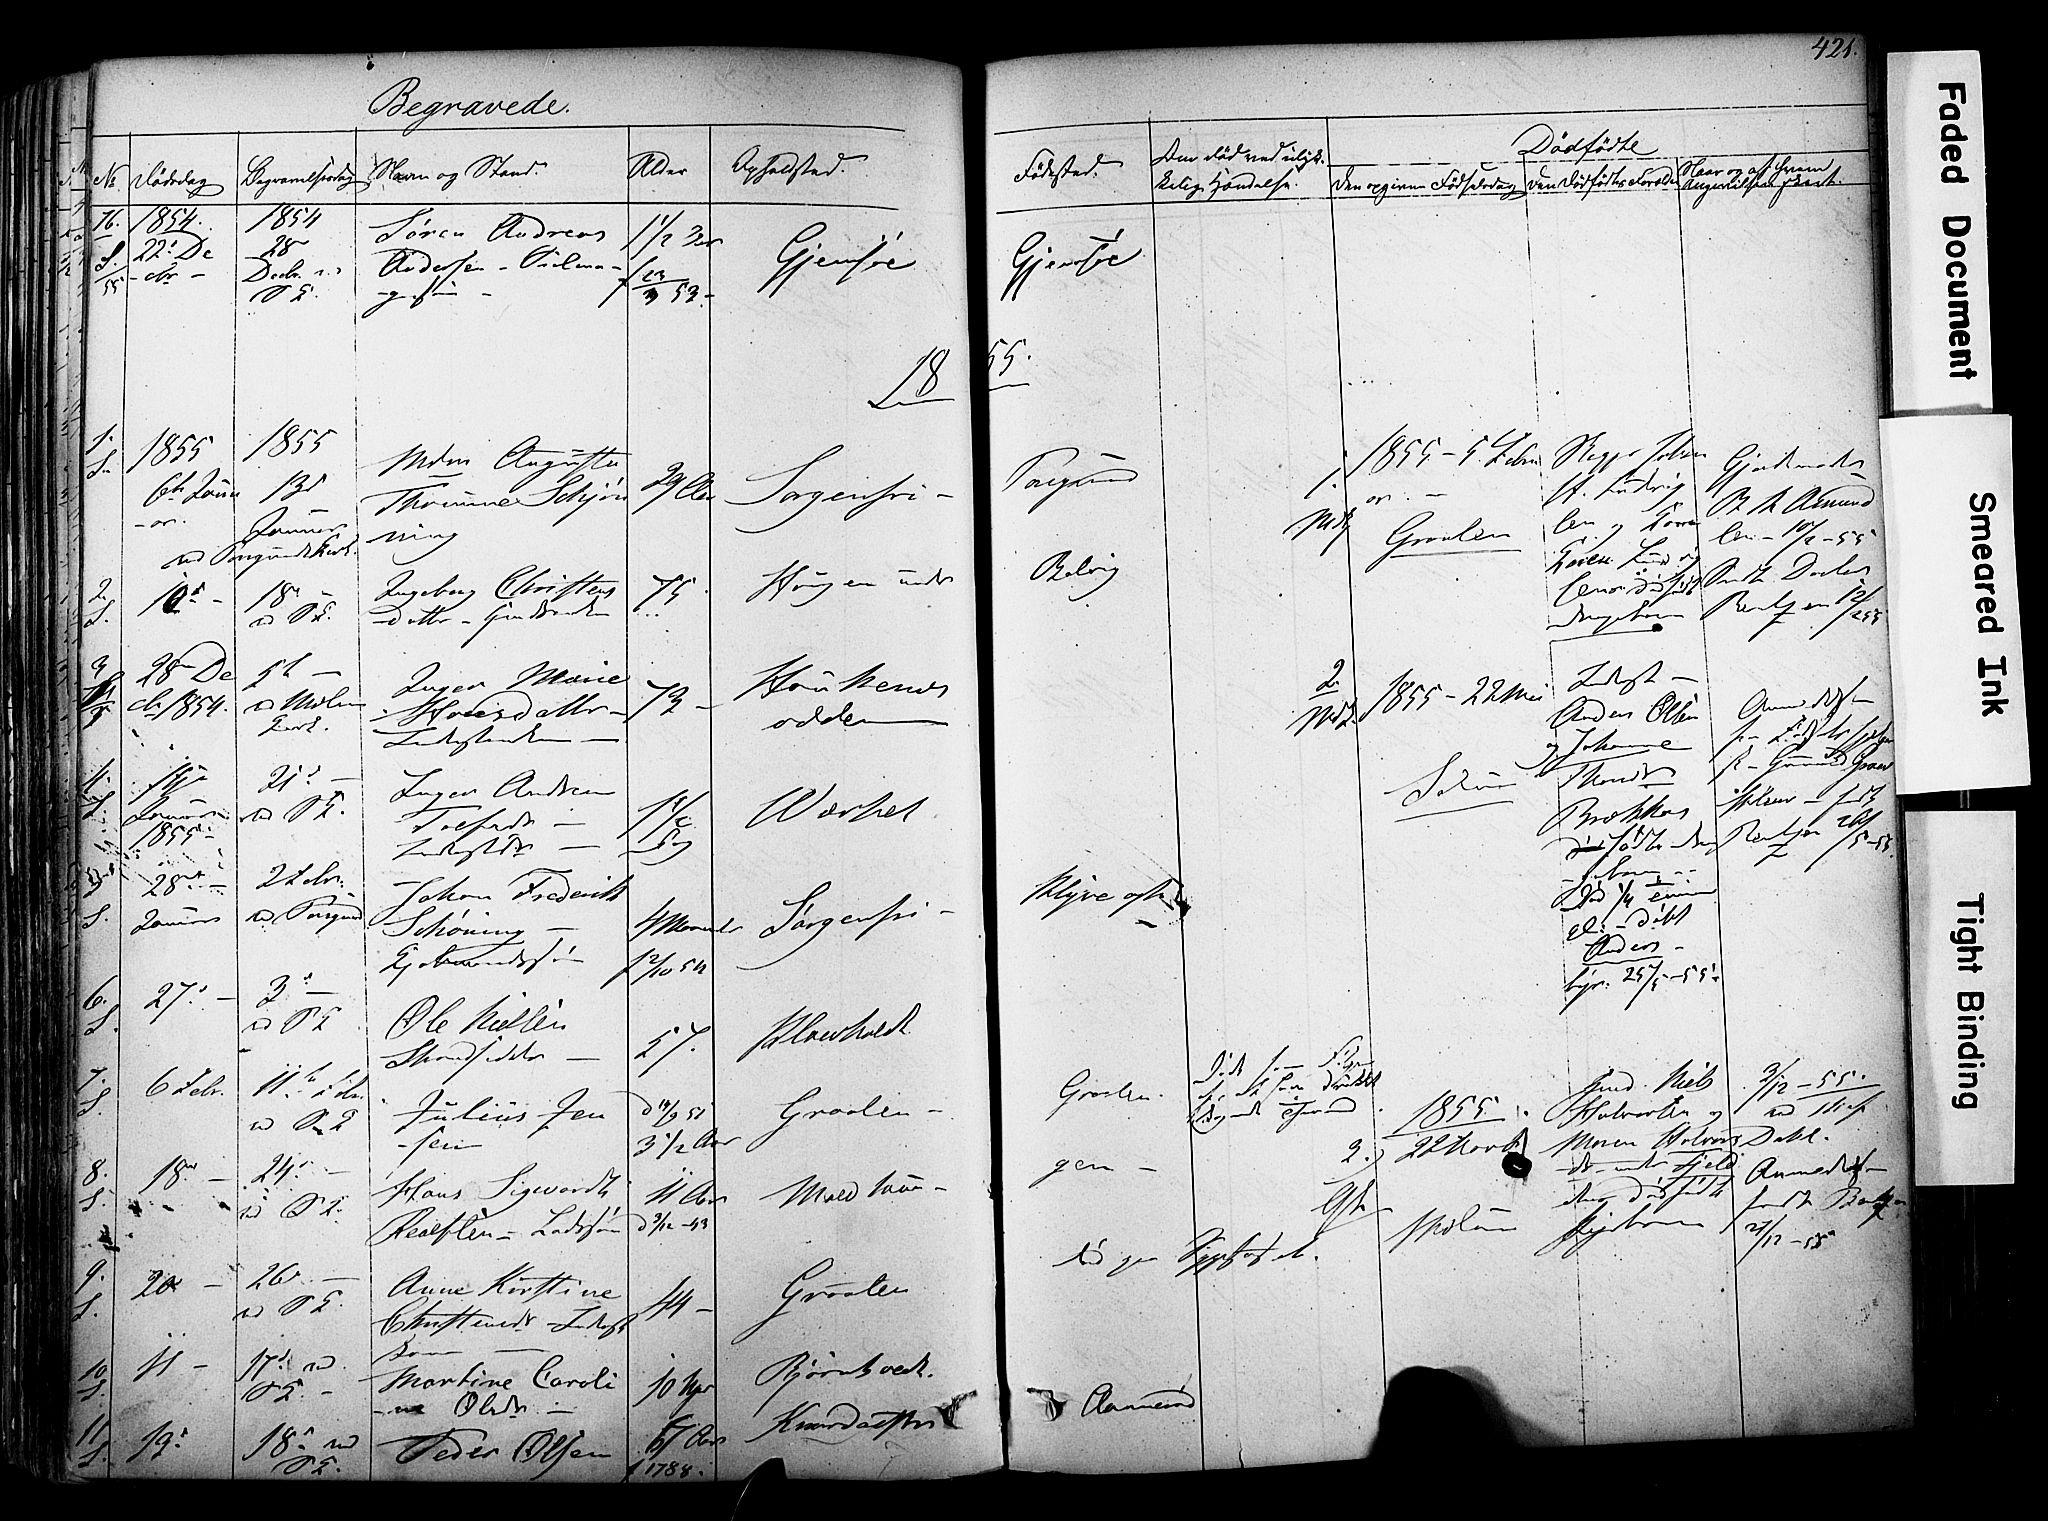 SAKO, Solum kirkebøker, F/Fa/L0006: Ministerialbok nr. I 6, 1844-1855, s. 421